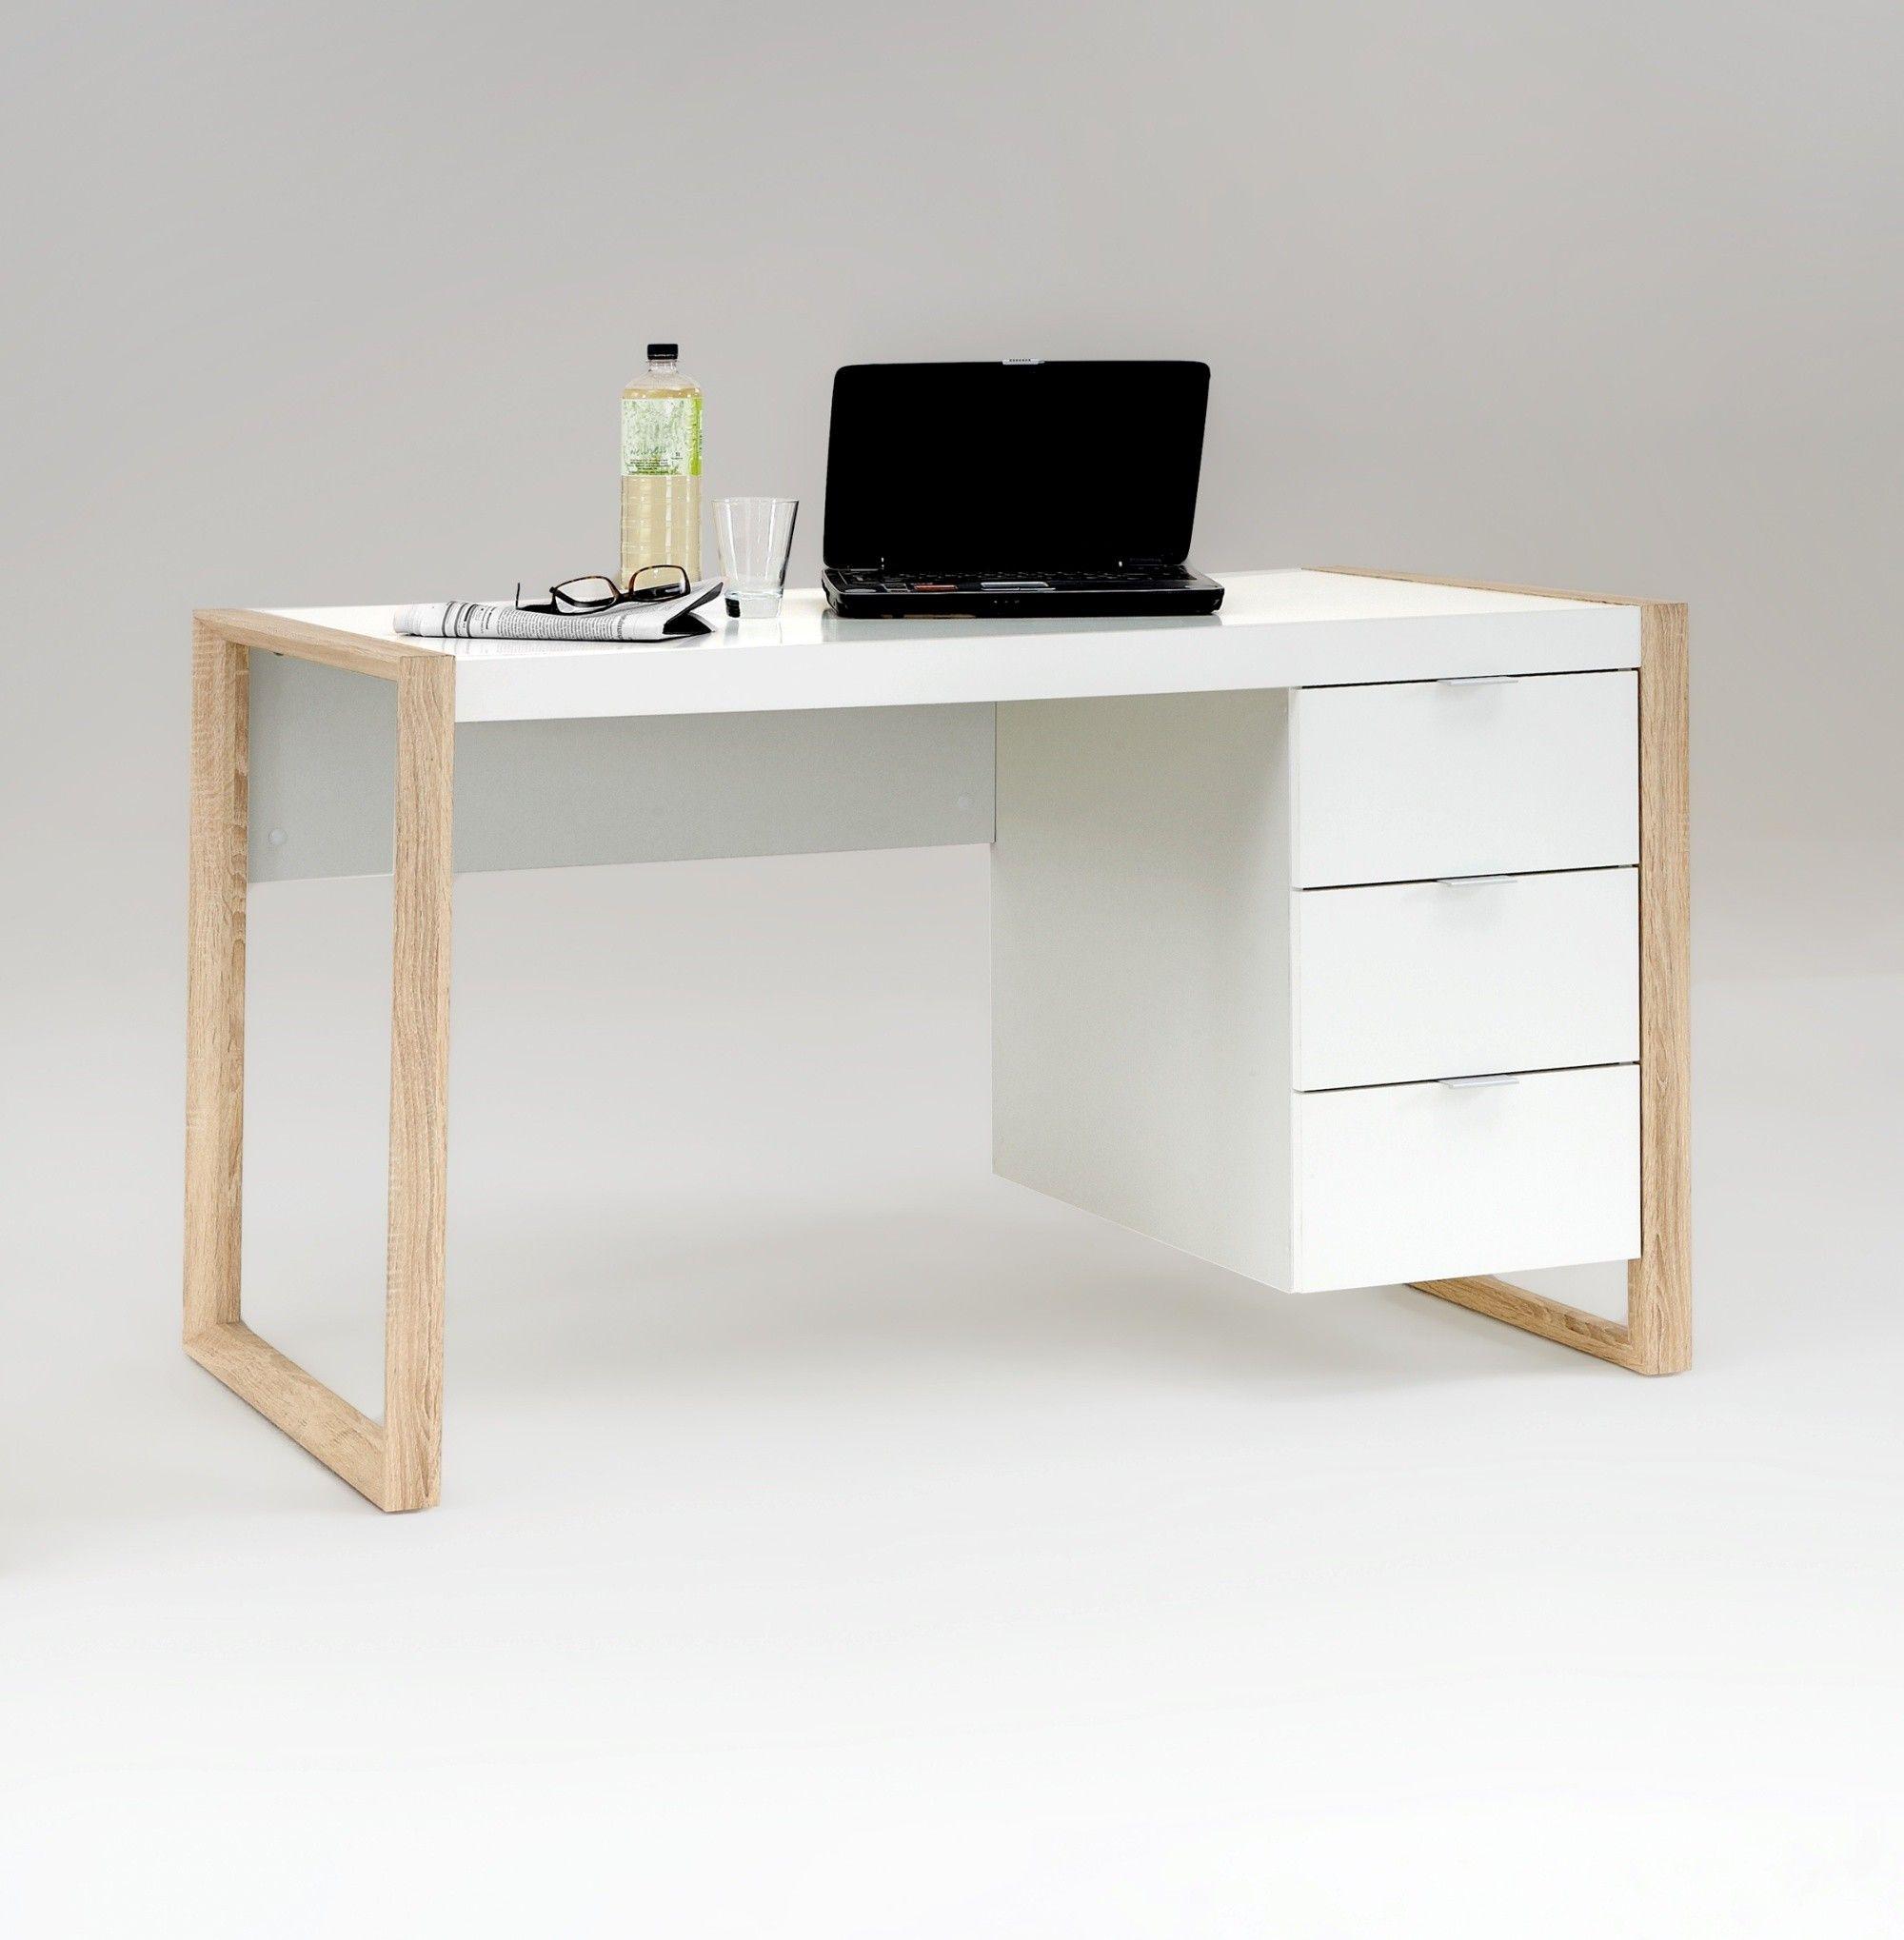 Bureau Design 3 Tiroirs Coloris Blanc Ch Ne Frany Jpg 2000 2038 Bureau Design Armoire Informatique Meuble Informatique